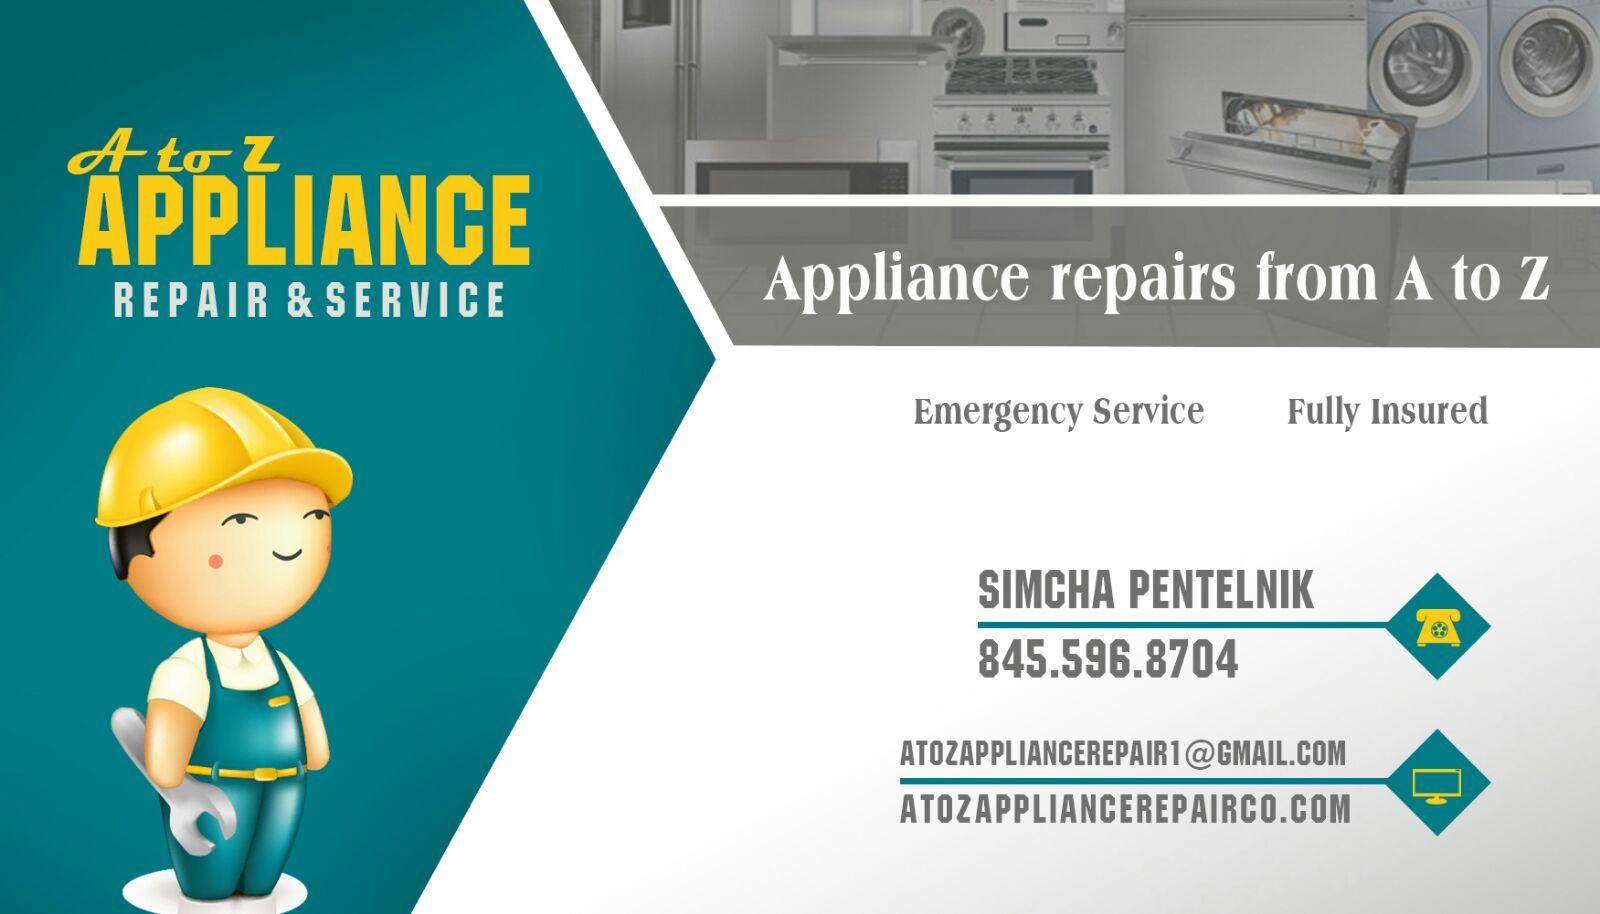 A TO Z Appliance Repair